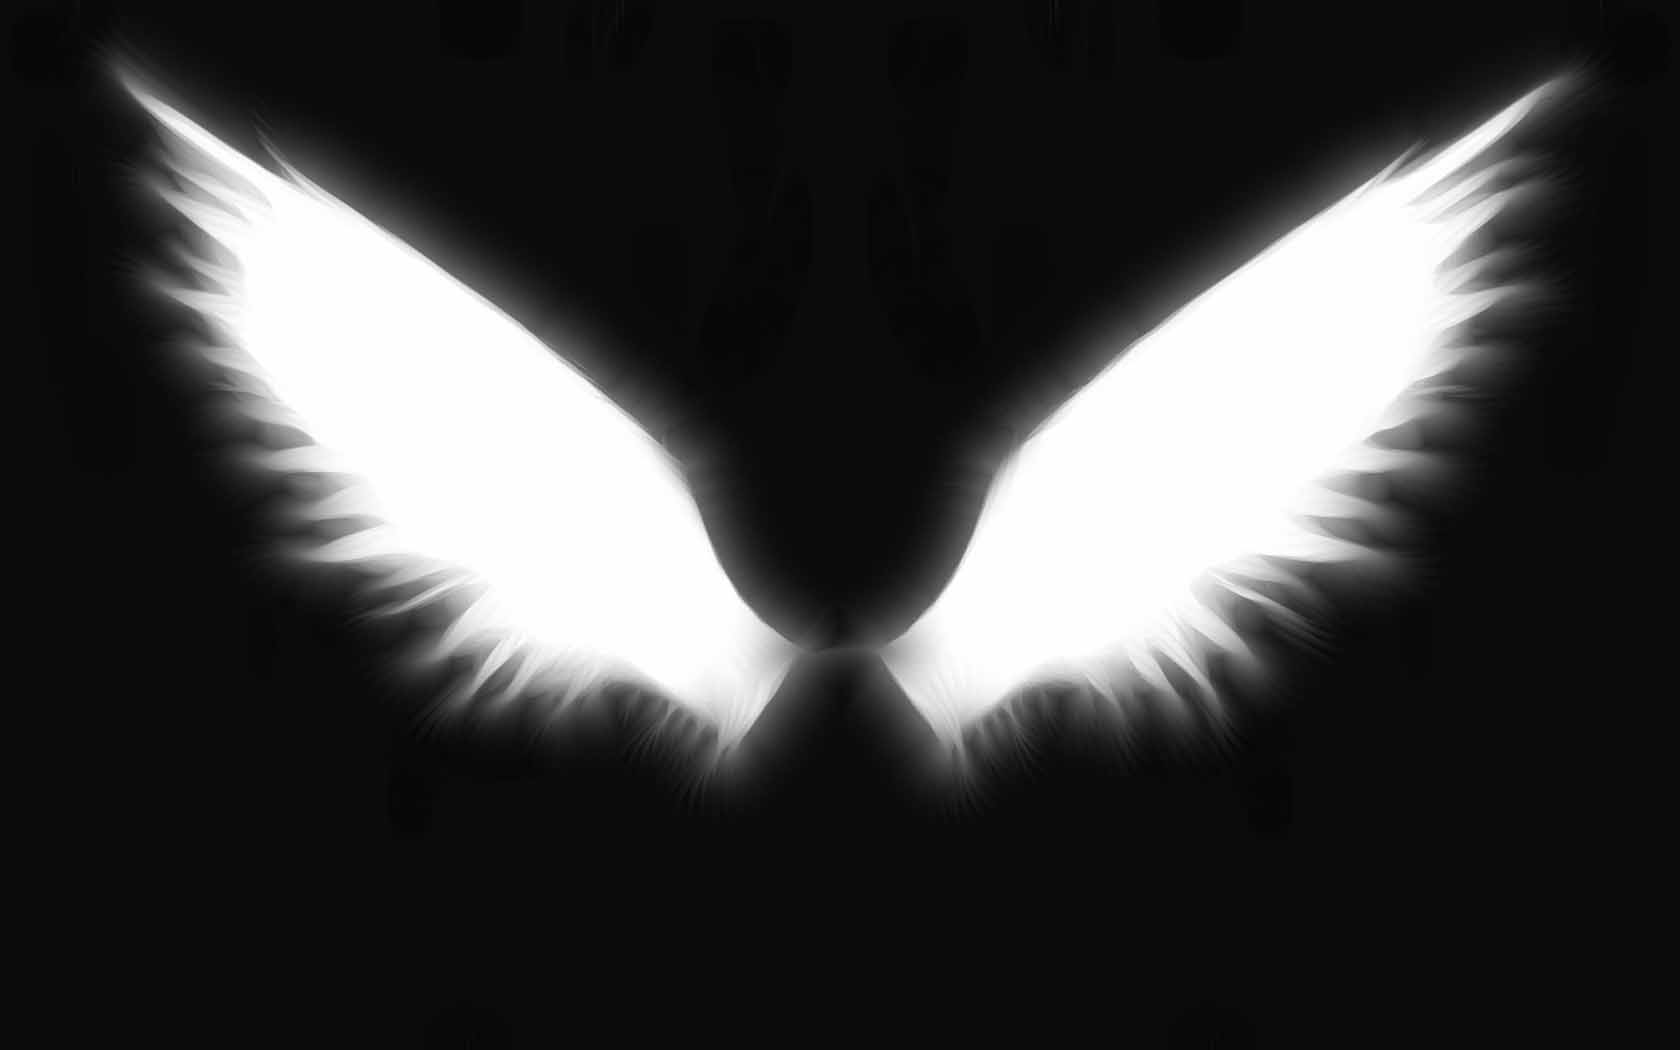 Angel Wings Wallpapers Top Free Angel Wings Backgrounds